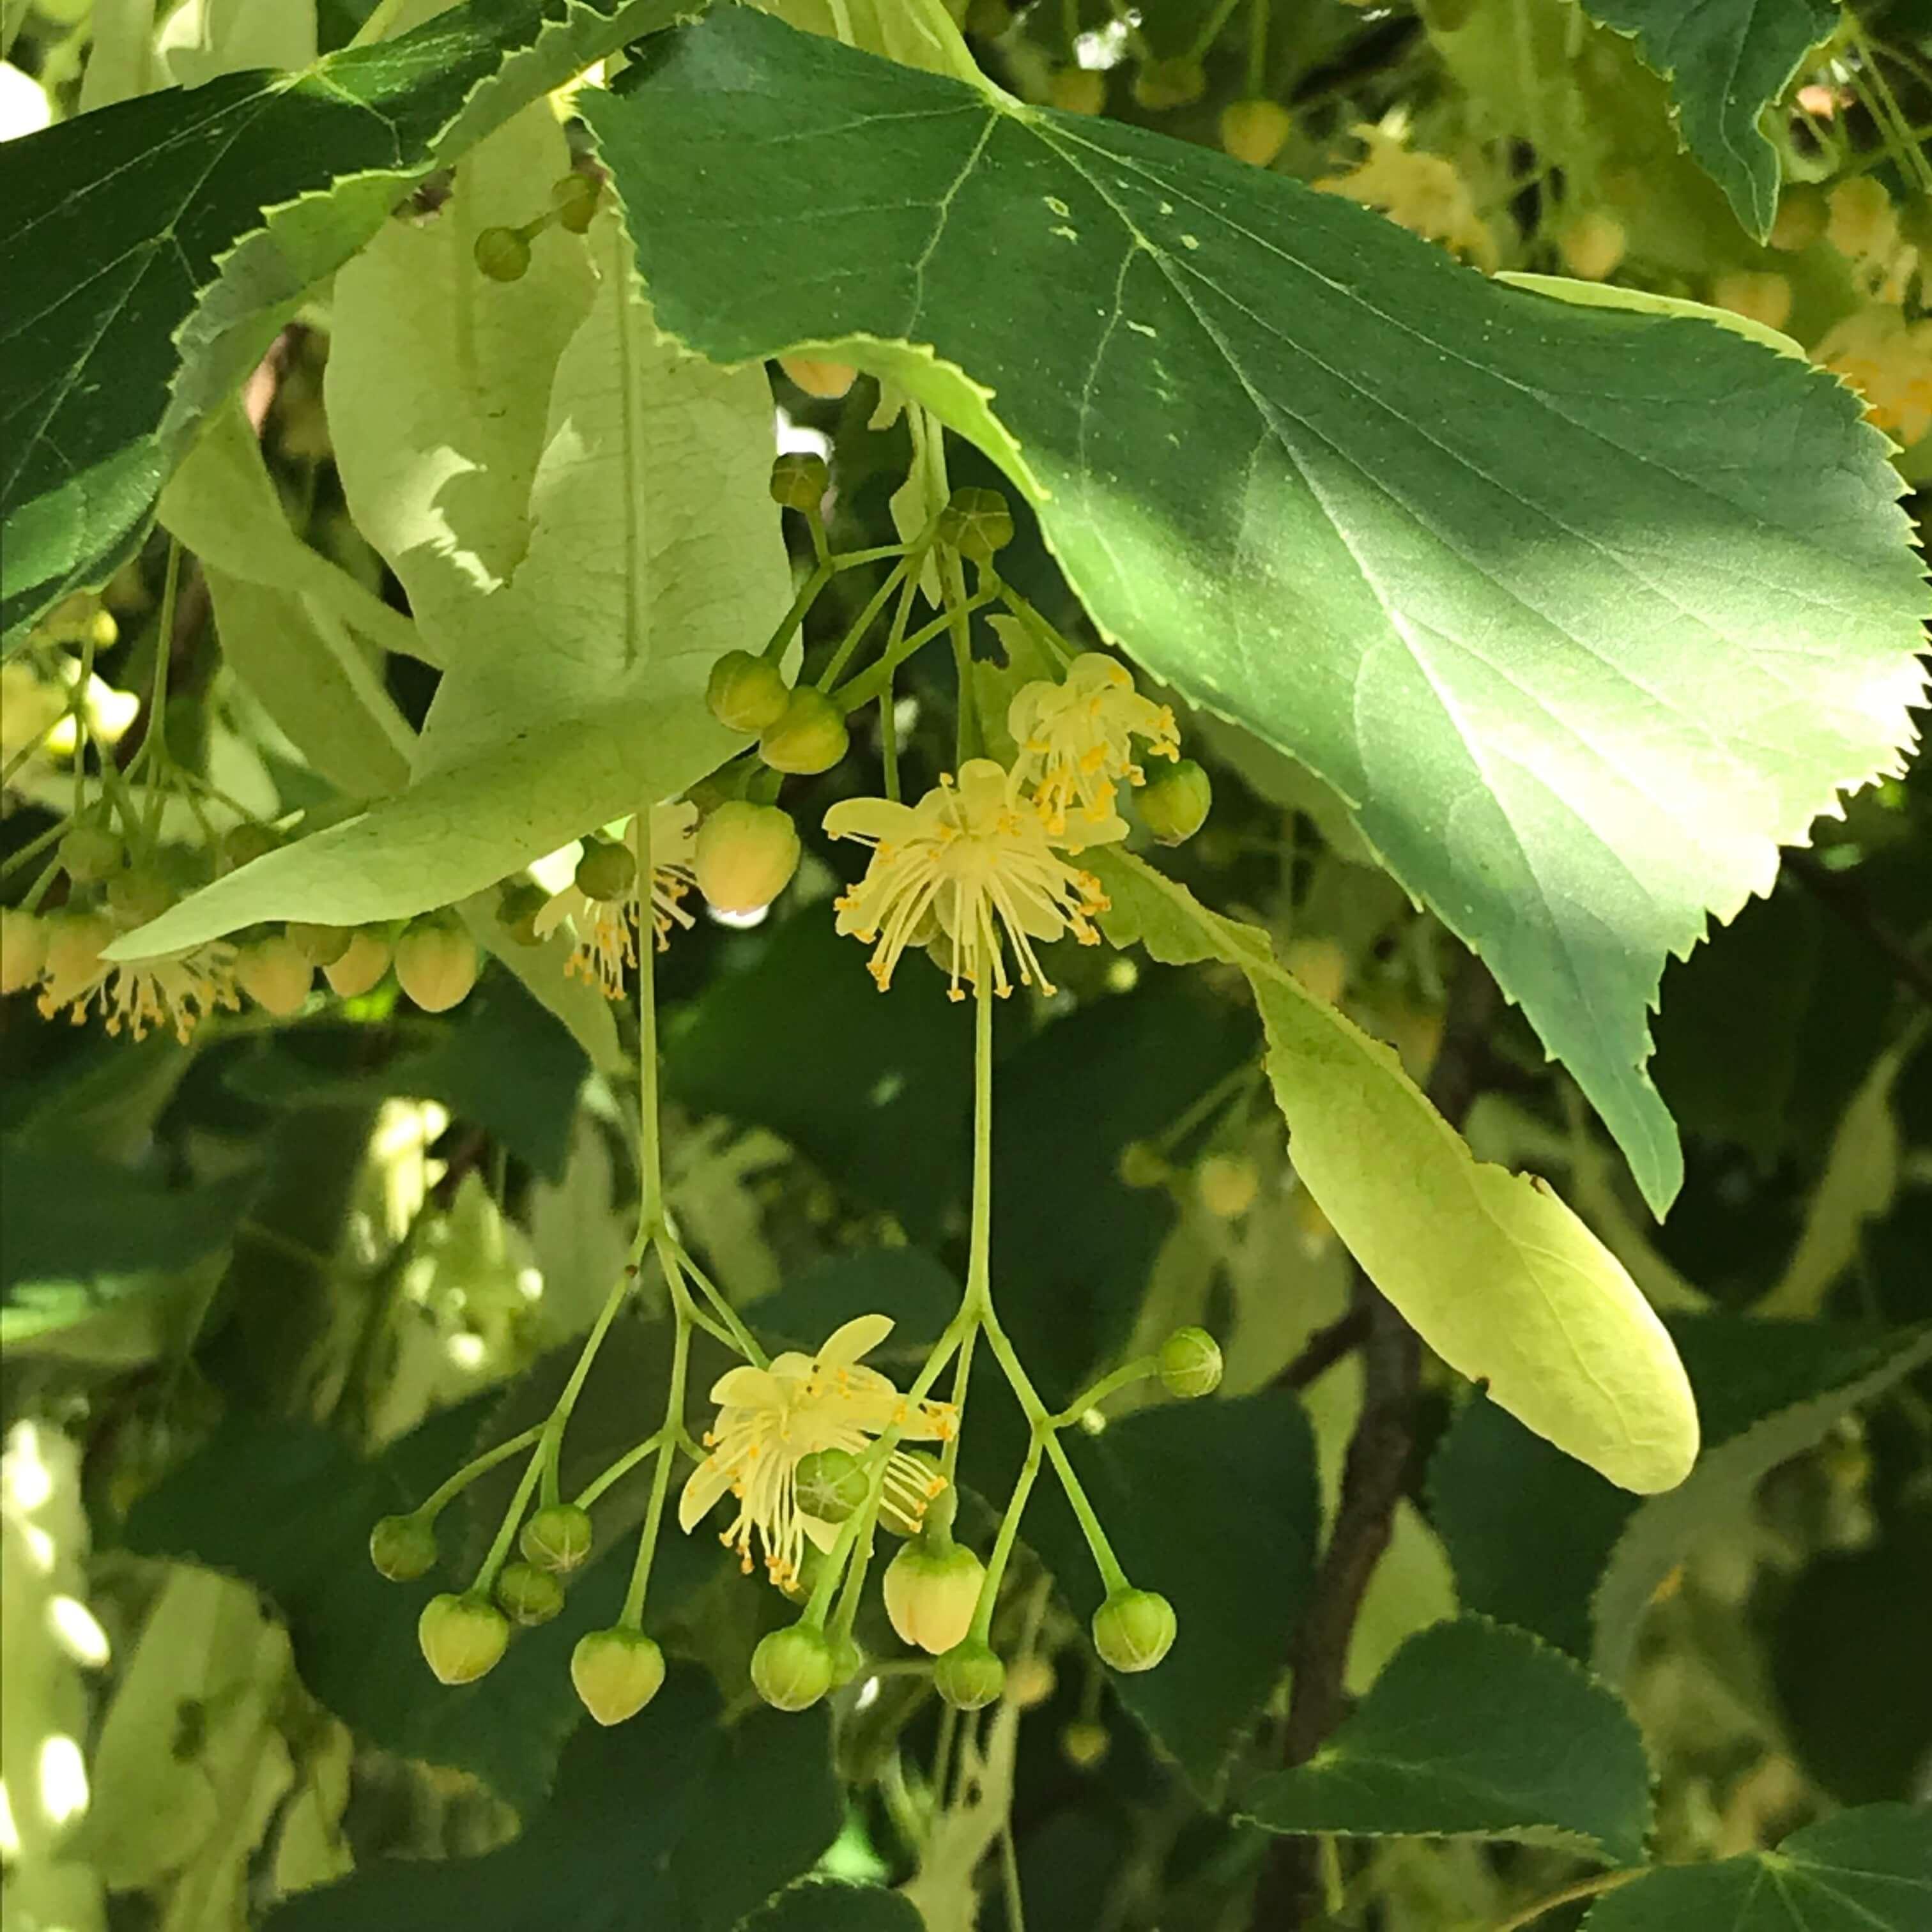 Lindenblütenöl selbermachen Lindenbaum